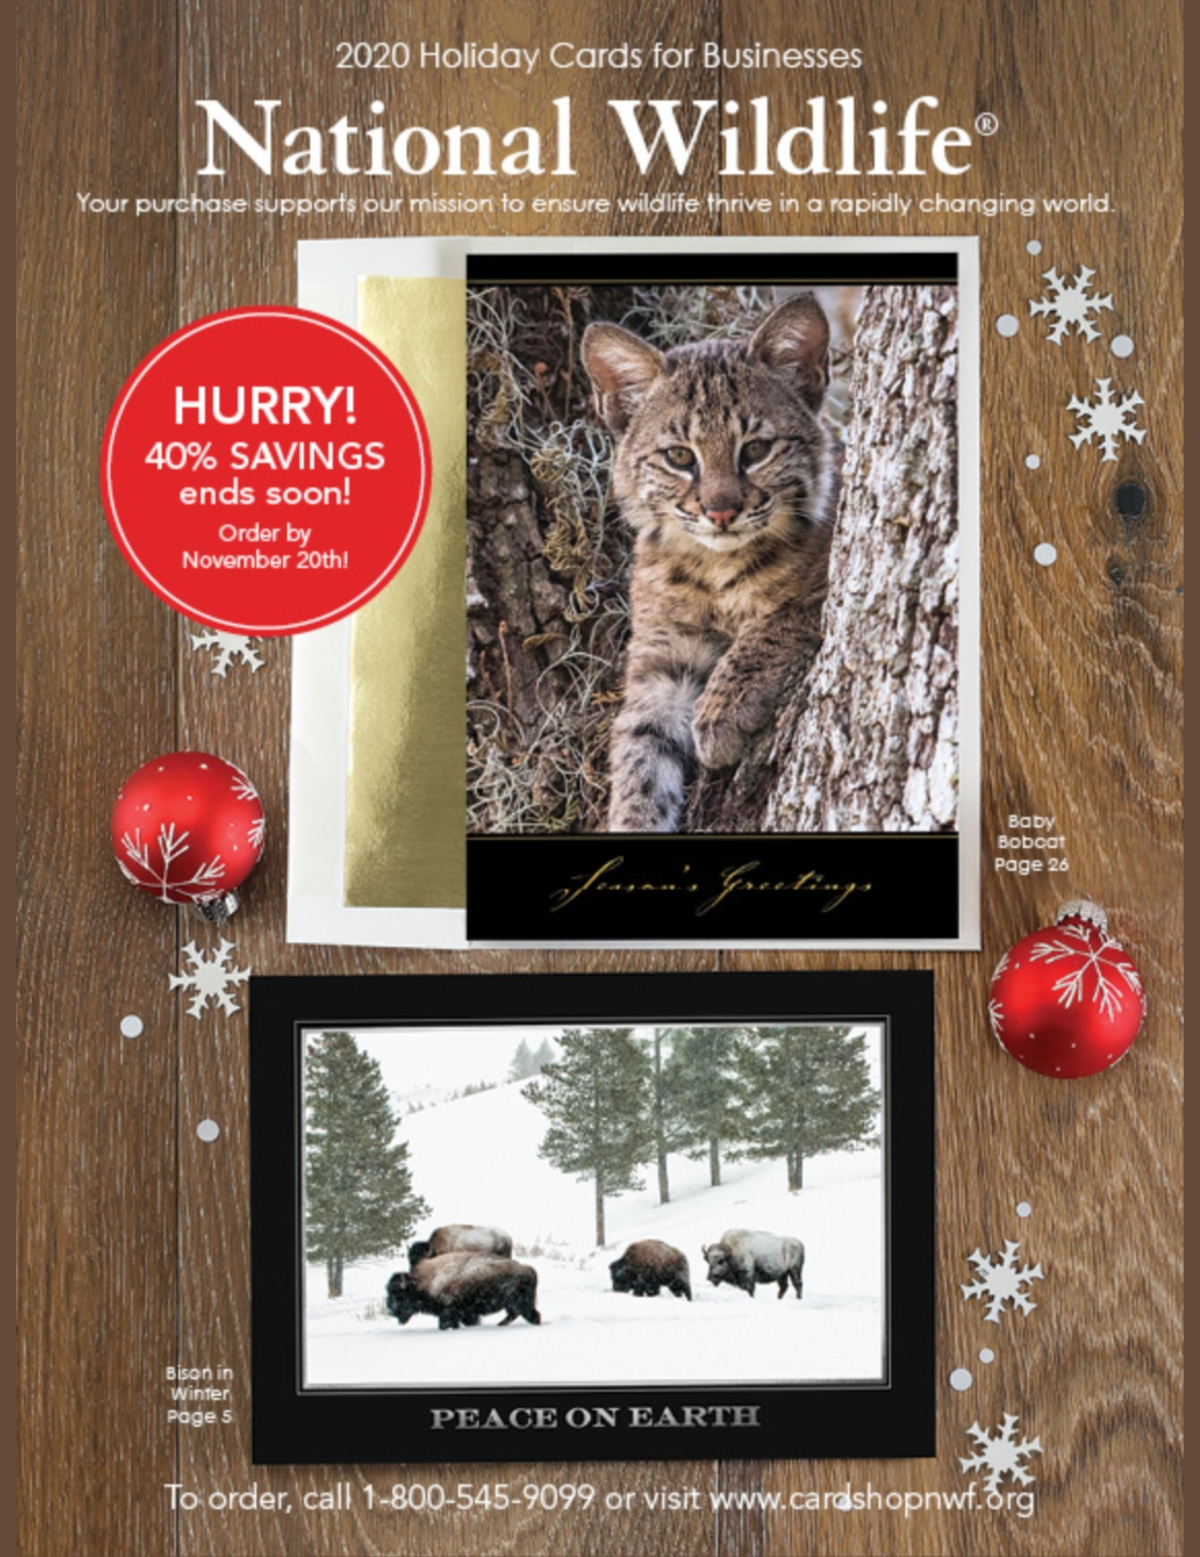 National Wildlife Christmas Cards 2021 Catalog 2020 Holiday Cards For Business The National Wildlife Federation